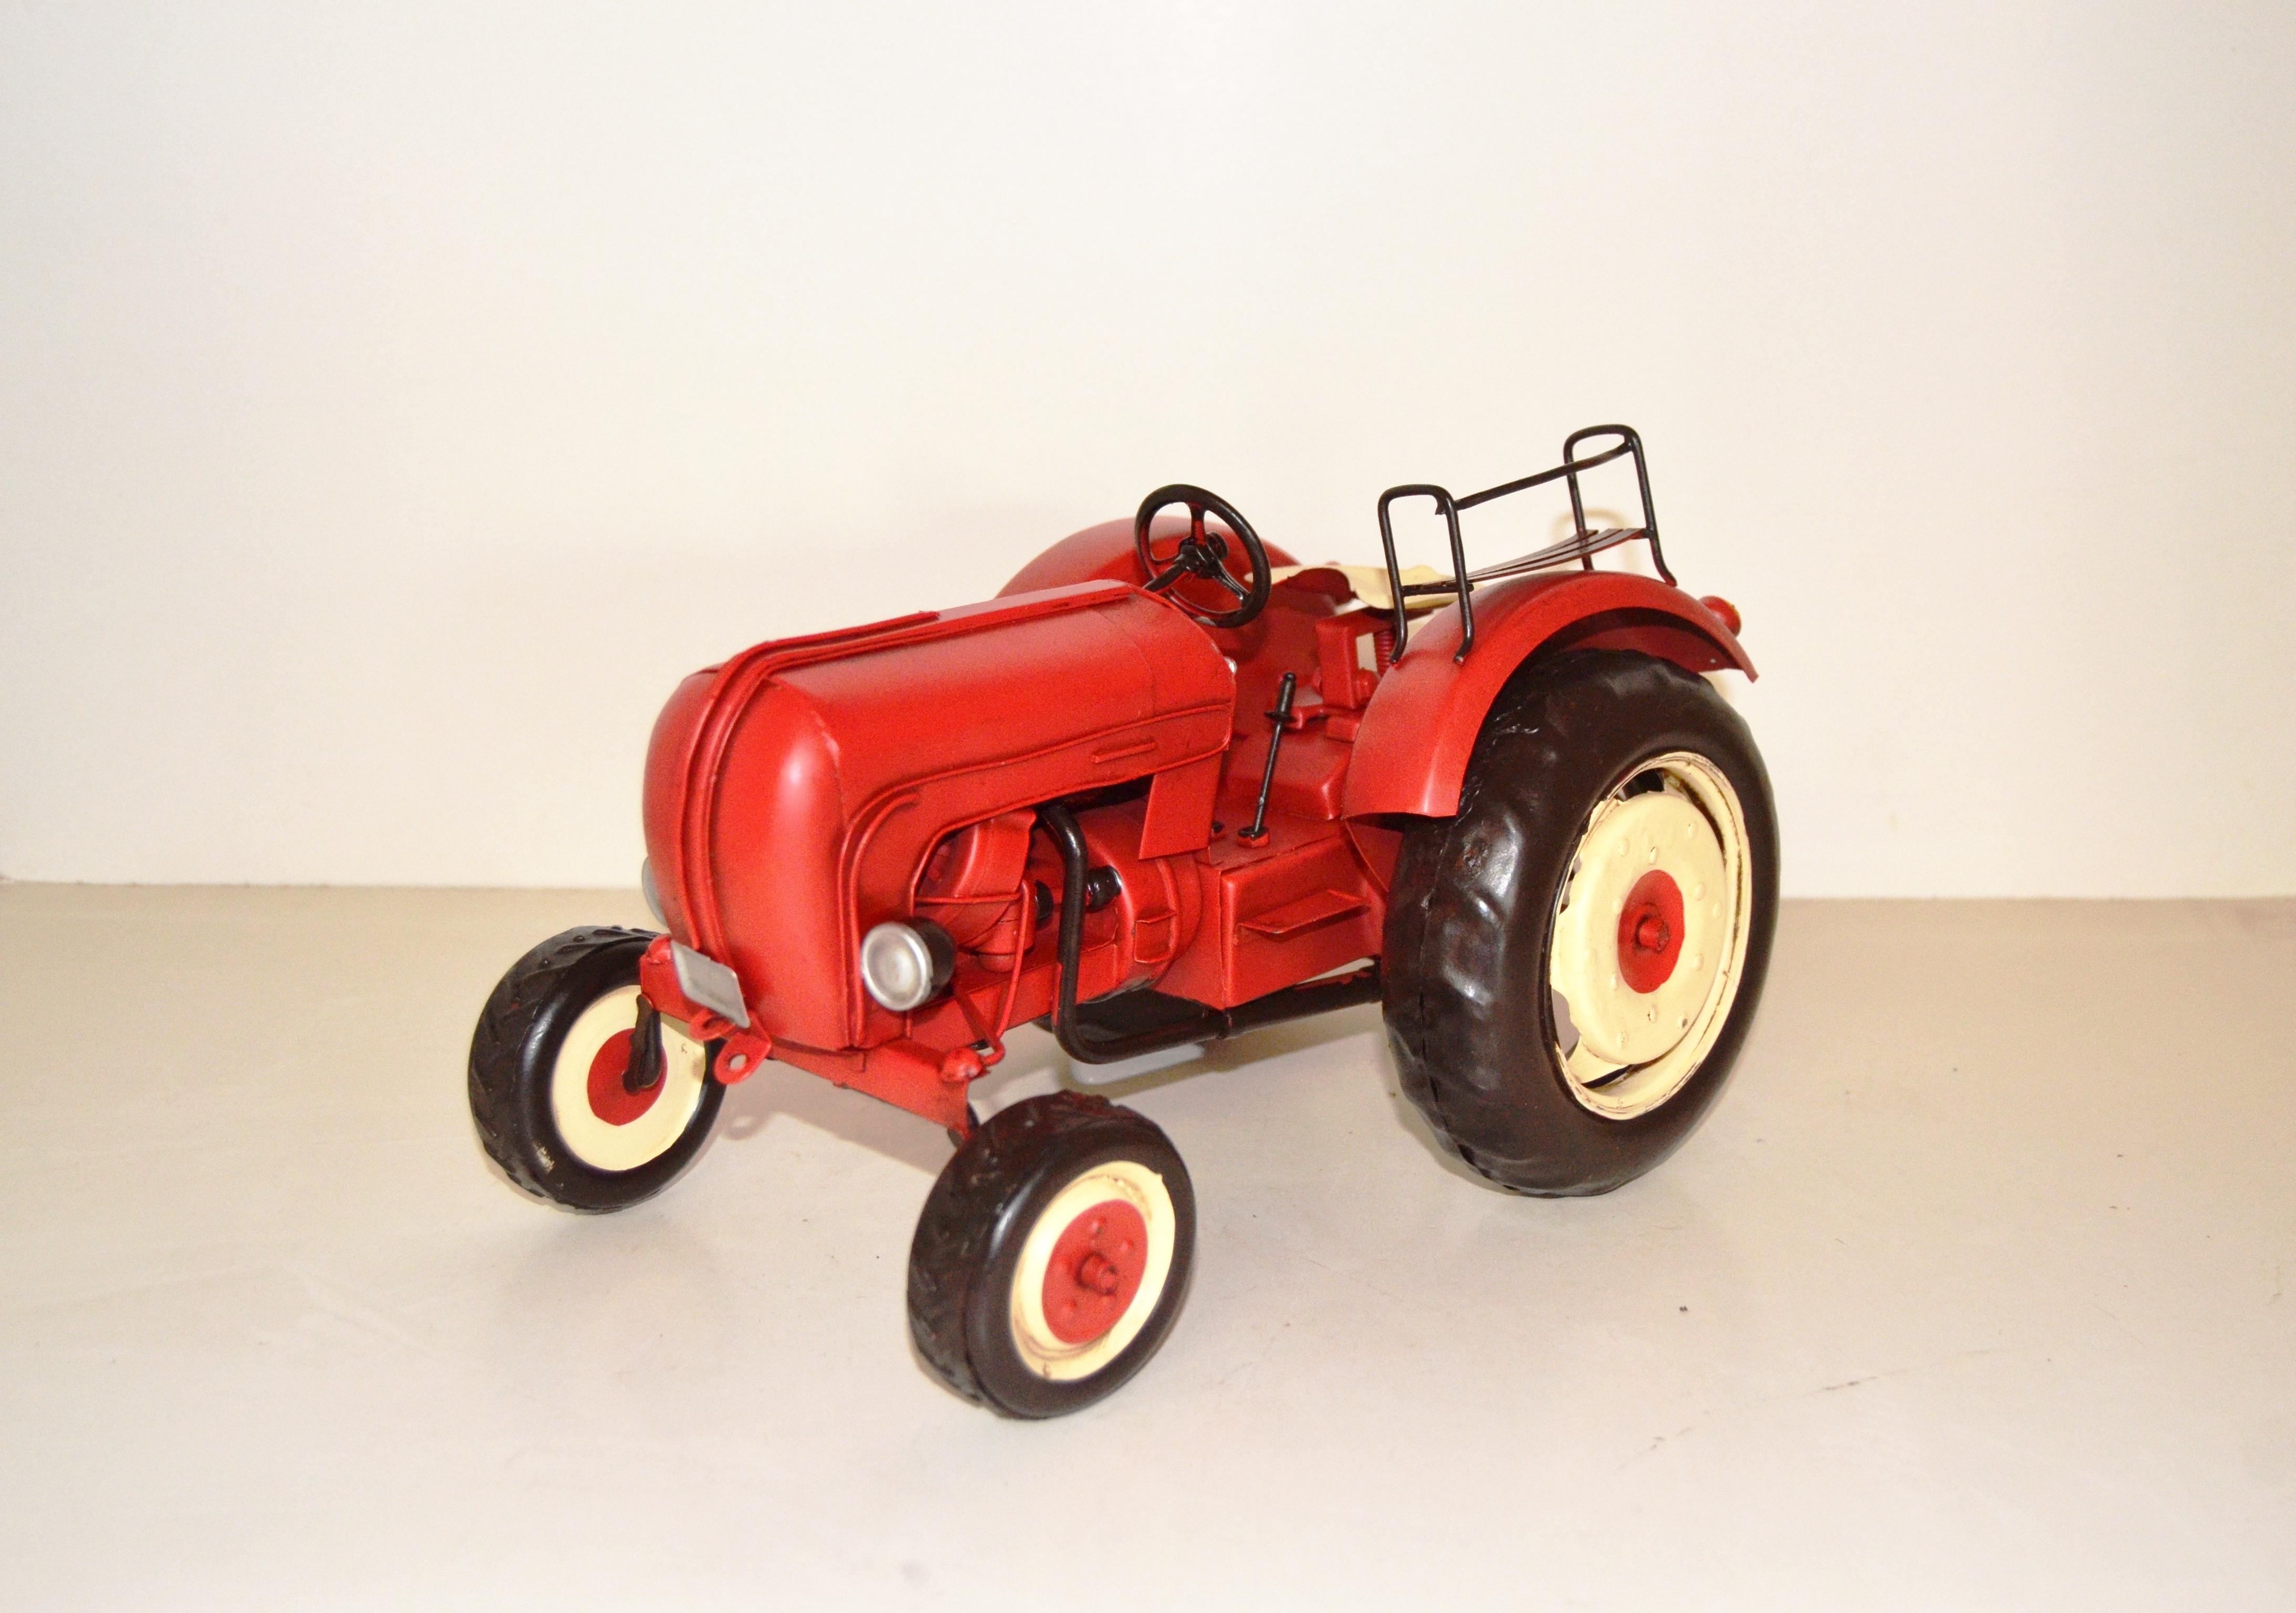 porsche diesel super l 319 traktor modell blechmodell. Black Bedroom Furniture Sets. Home Design Ideas